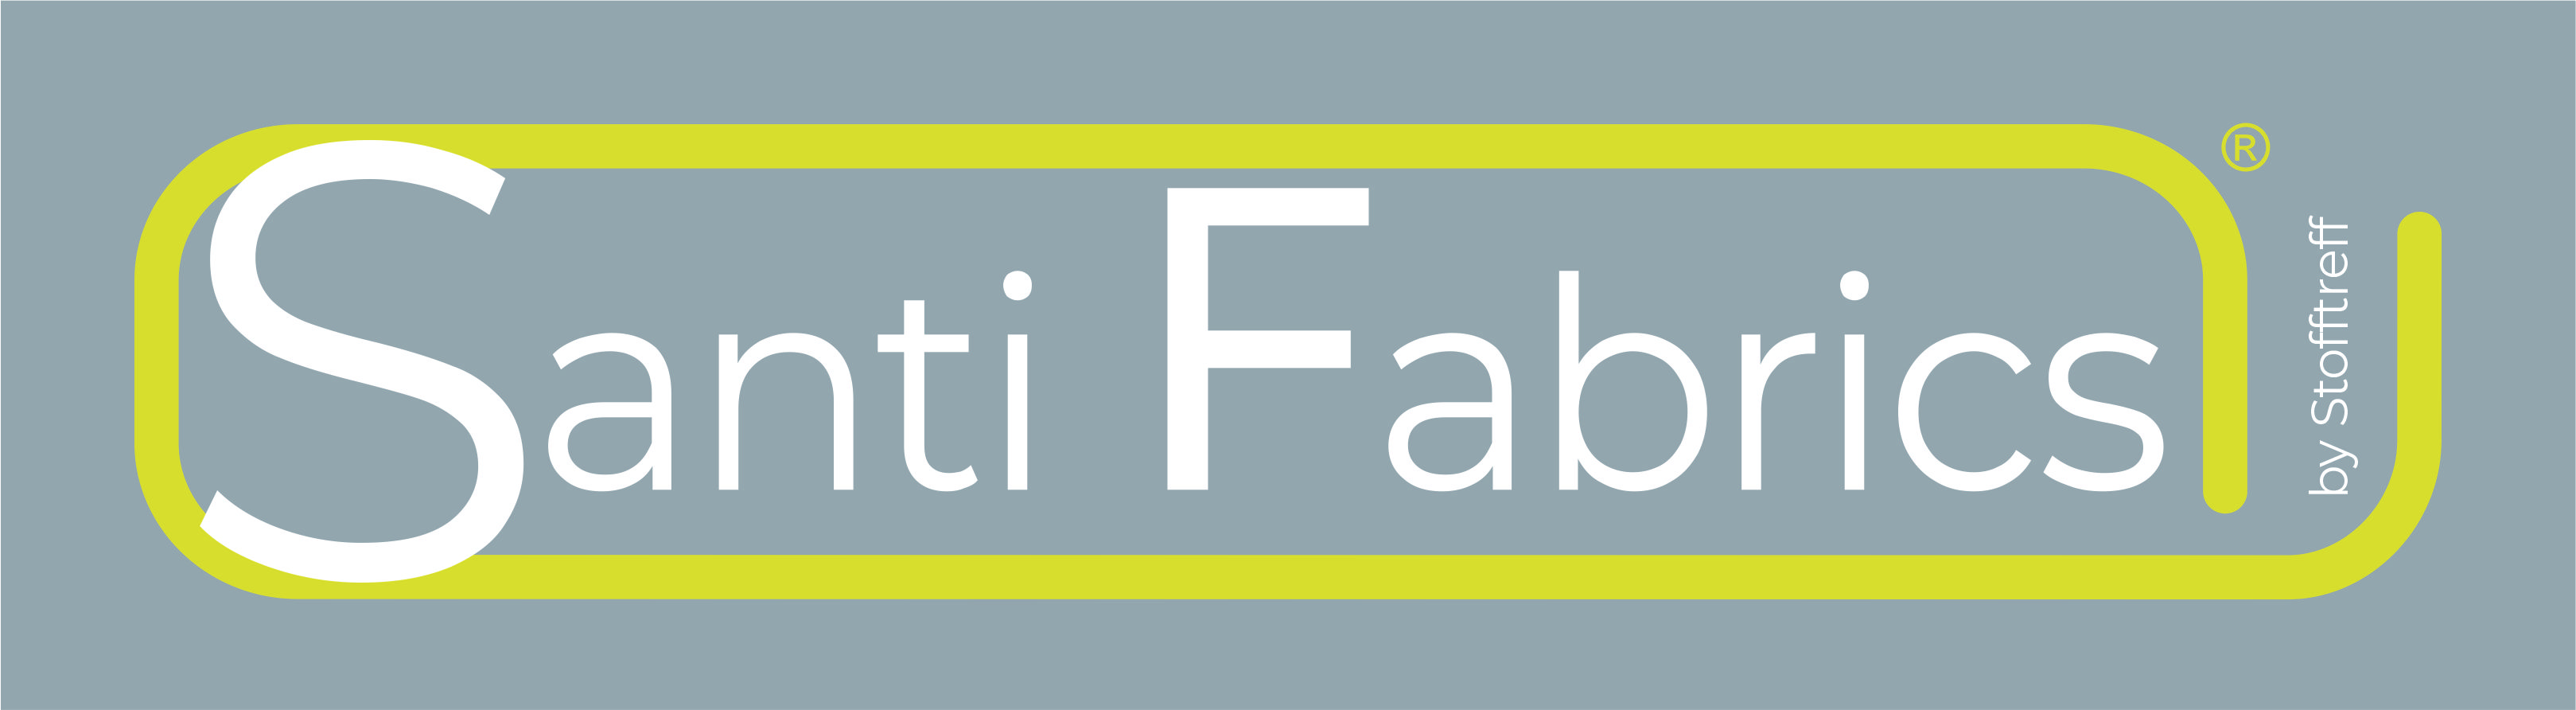 Santi Fabrics by Stofftreff - Großhandel